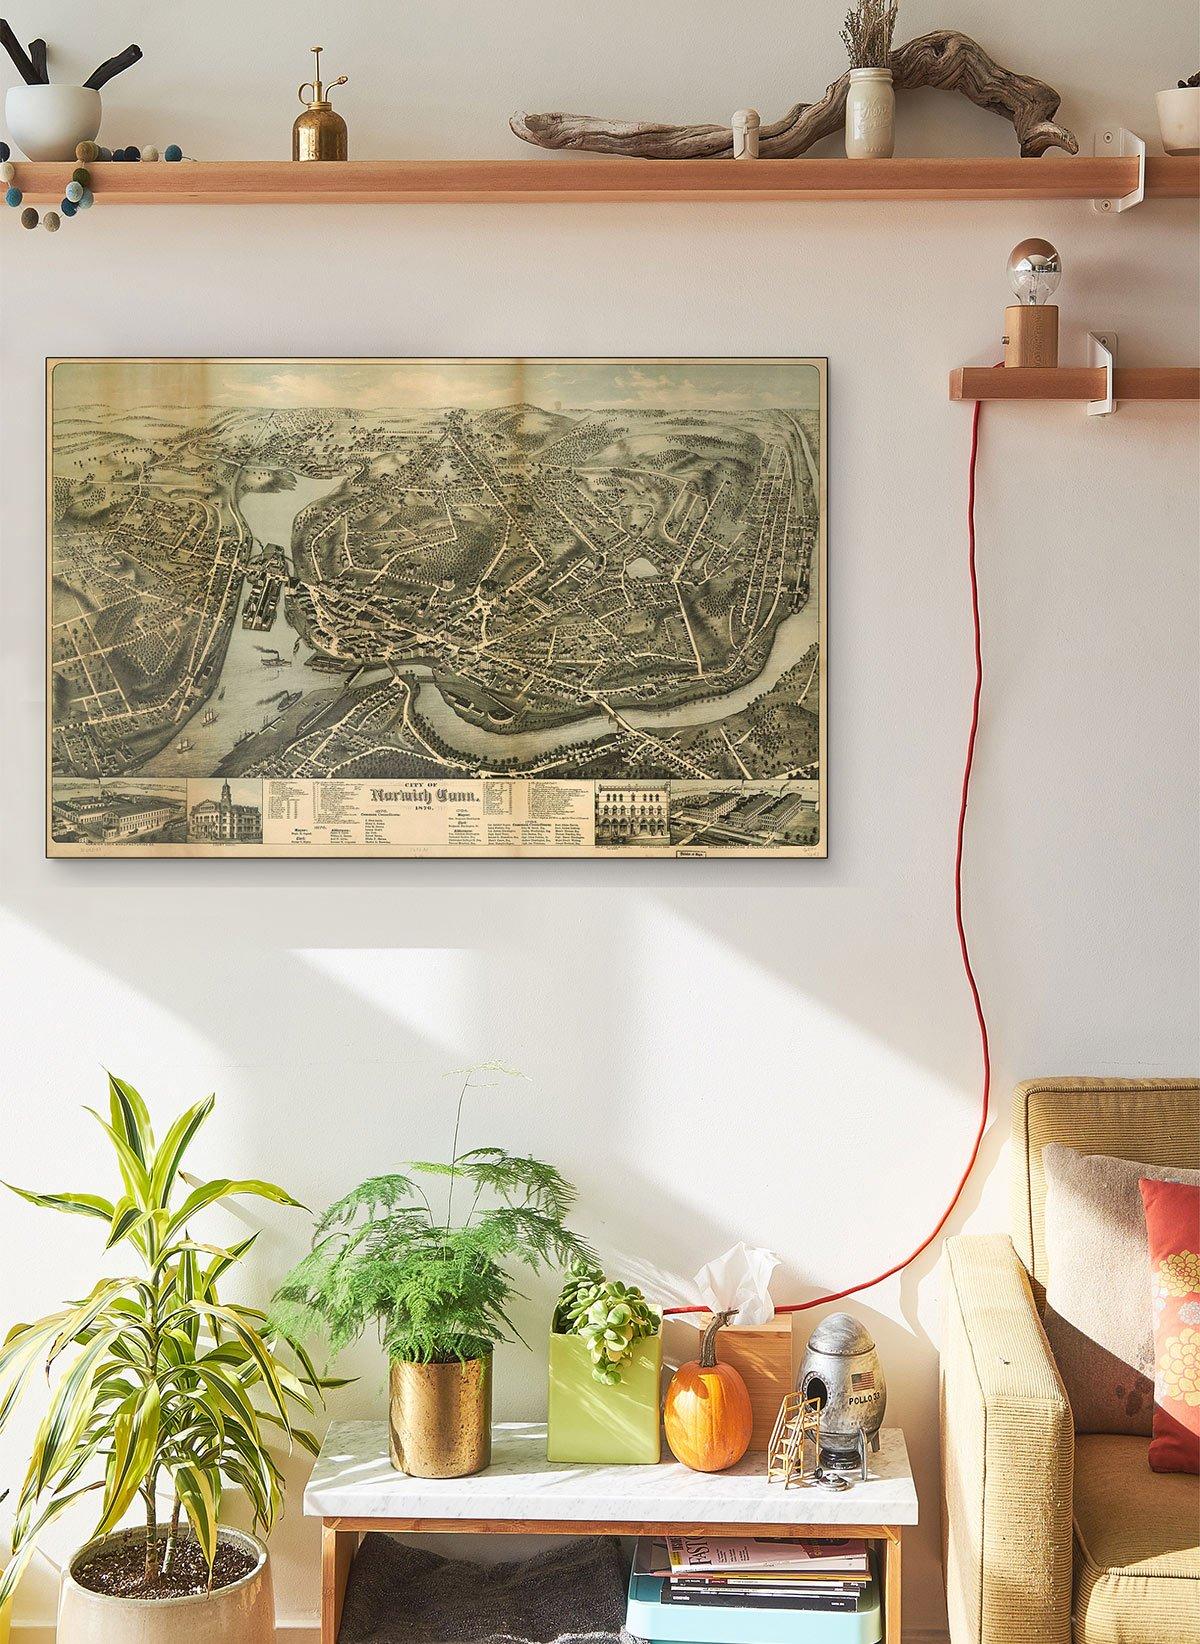 City Of Norwich Conn 1876 LARGE Vintage Map